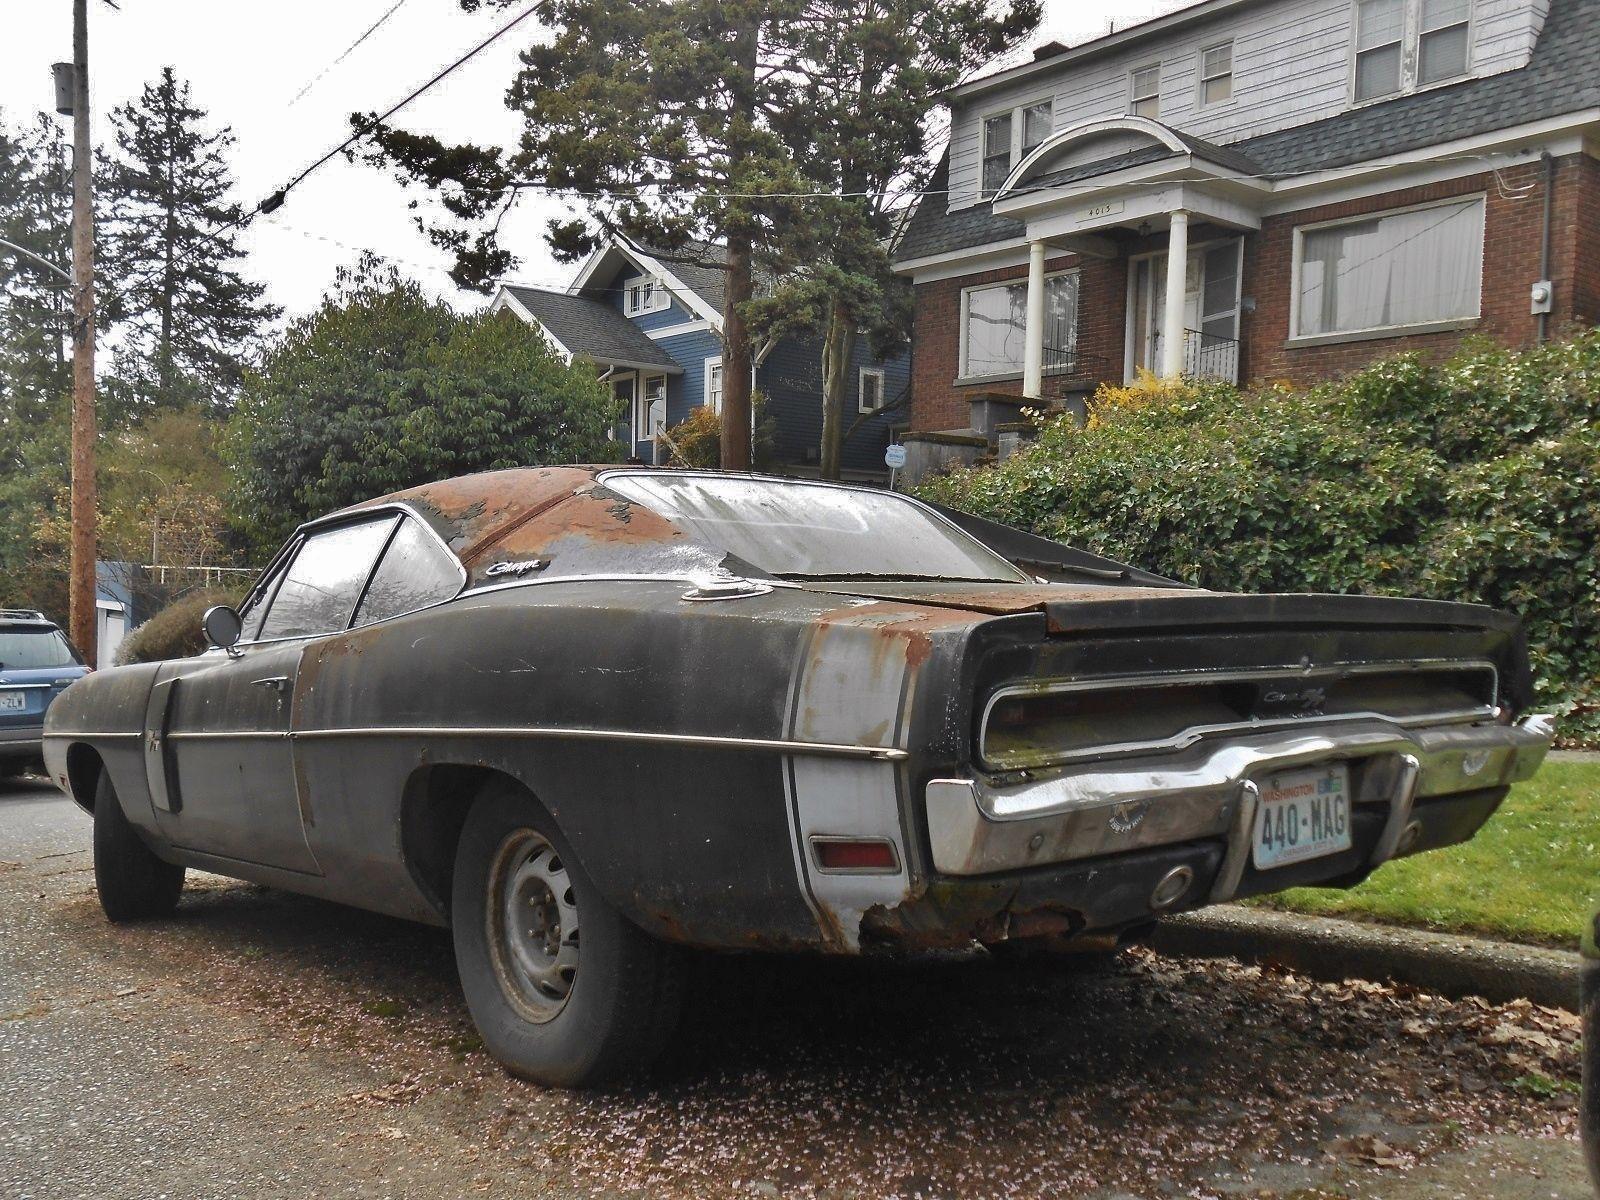 1955 dodge royal barn find for sale - 1970 Dodge Charger R T